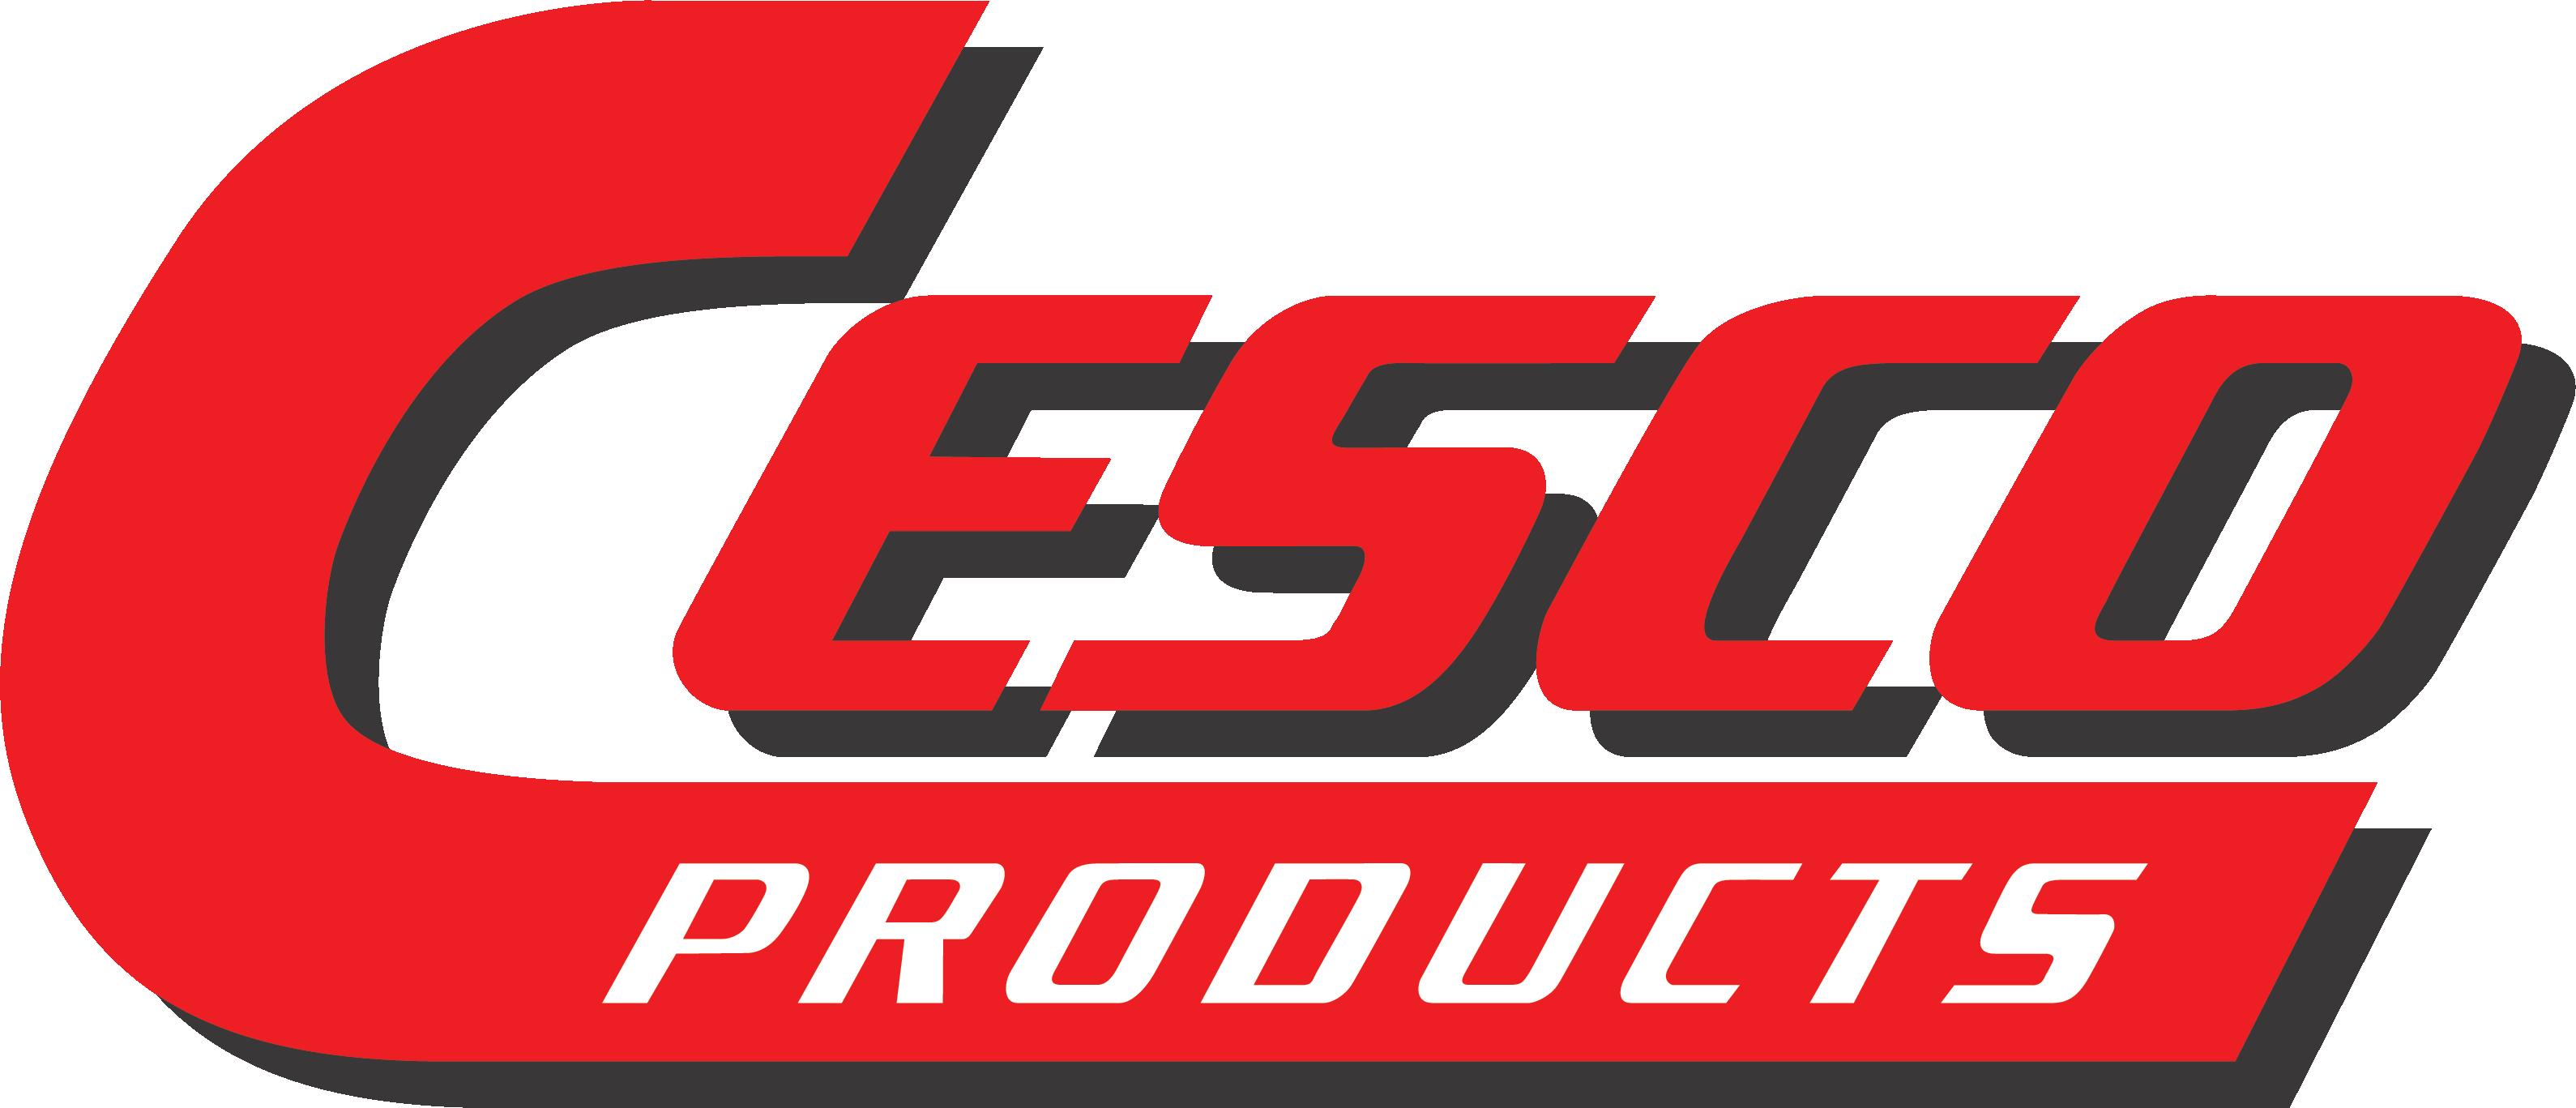 Cesco Products Logo